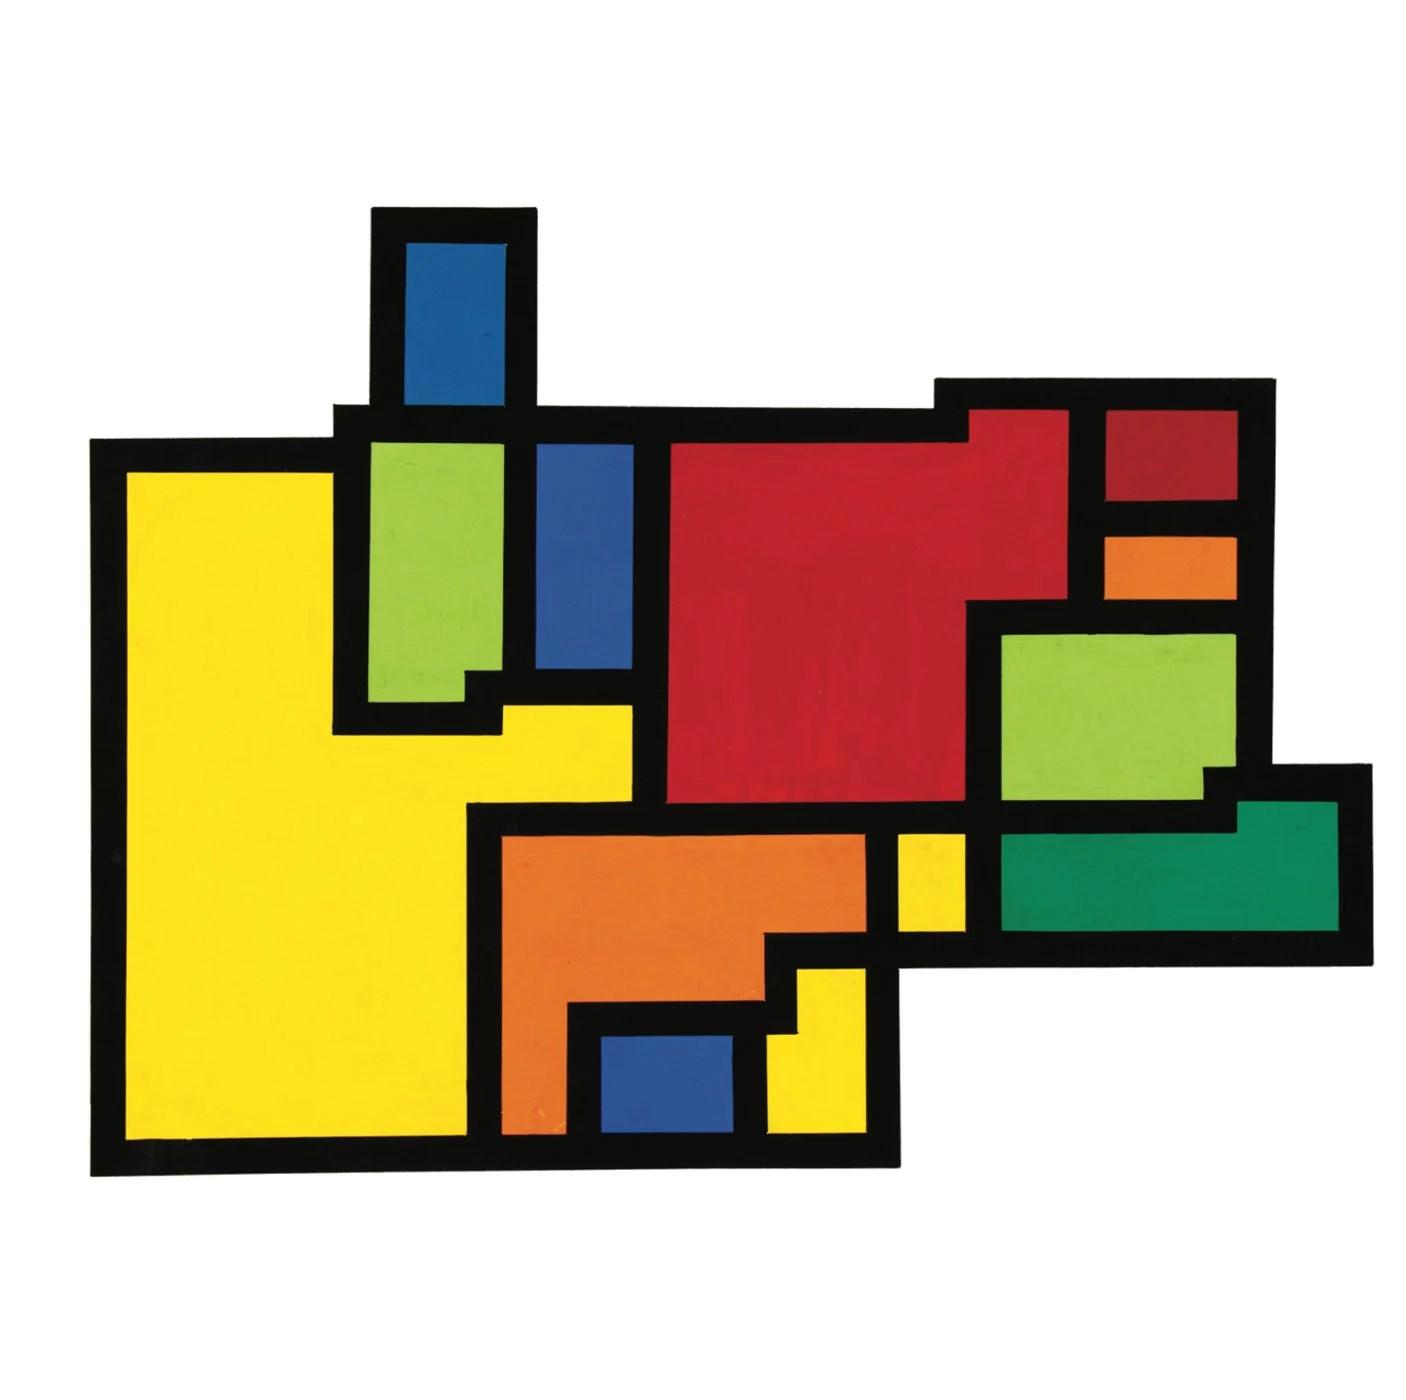 Hiroshi Kawano, Artificial Mondrian, painting - computer generated, 1966